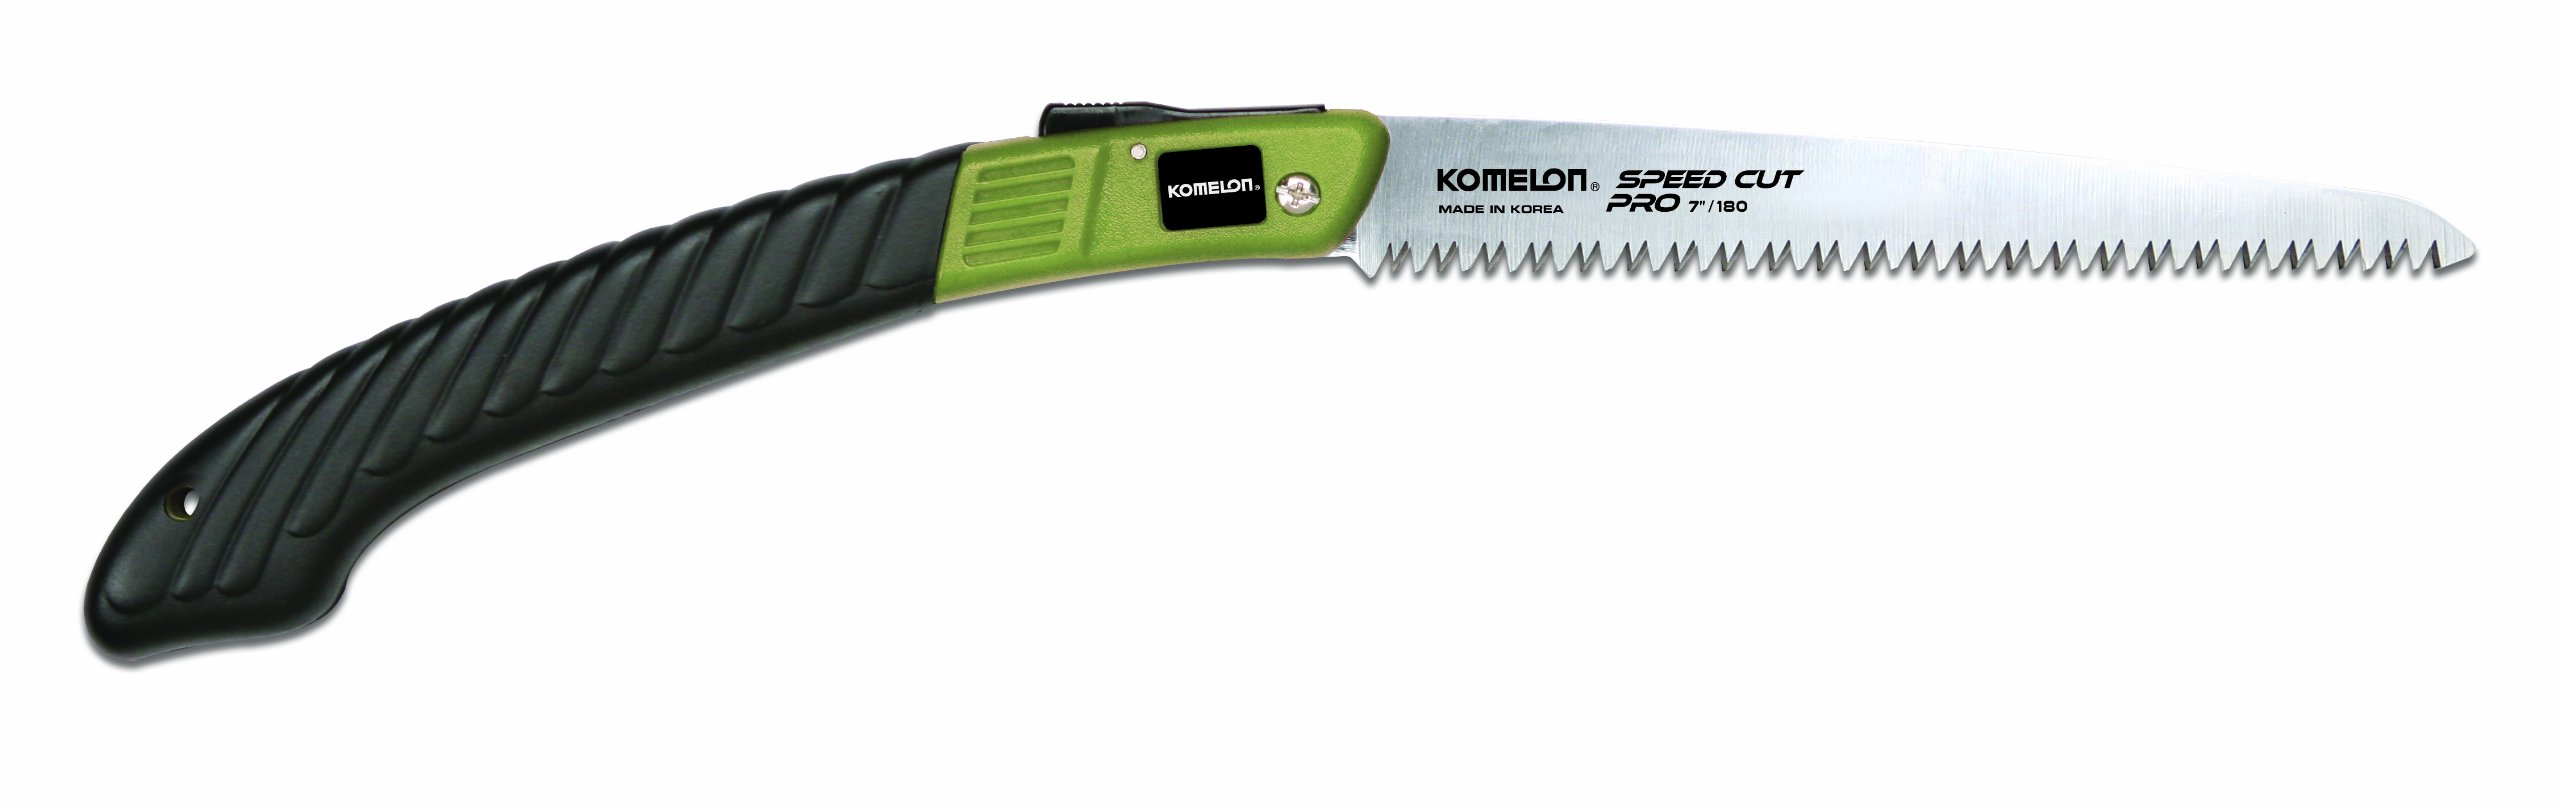 Komelon Speed Cut Pro Folding Pruning Saw, 9-1/2-Inch